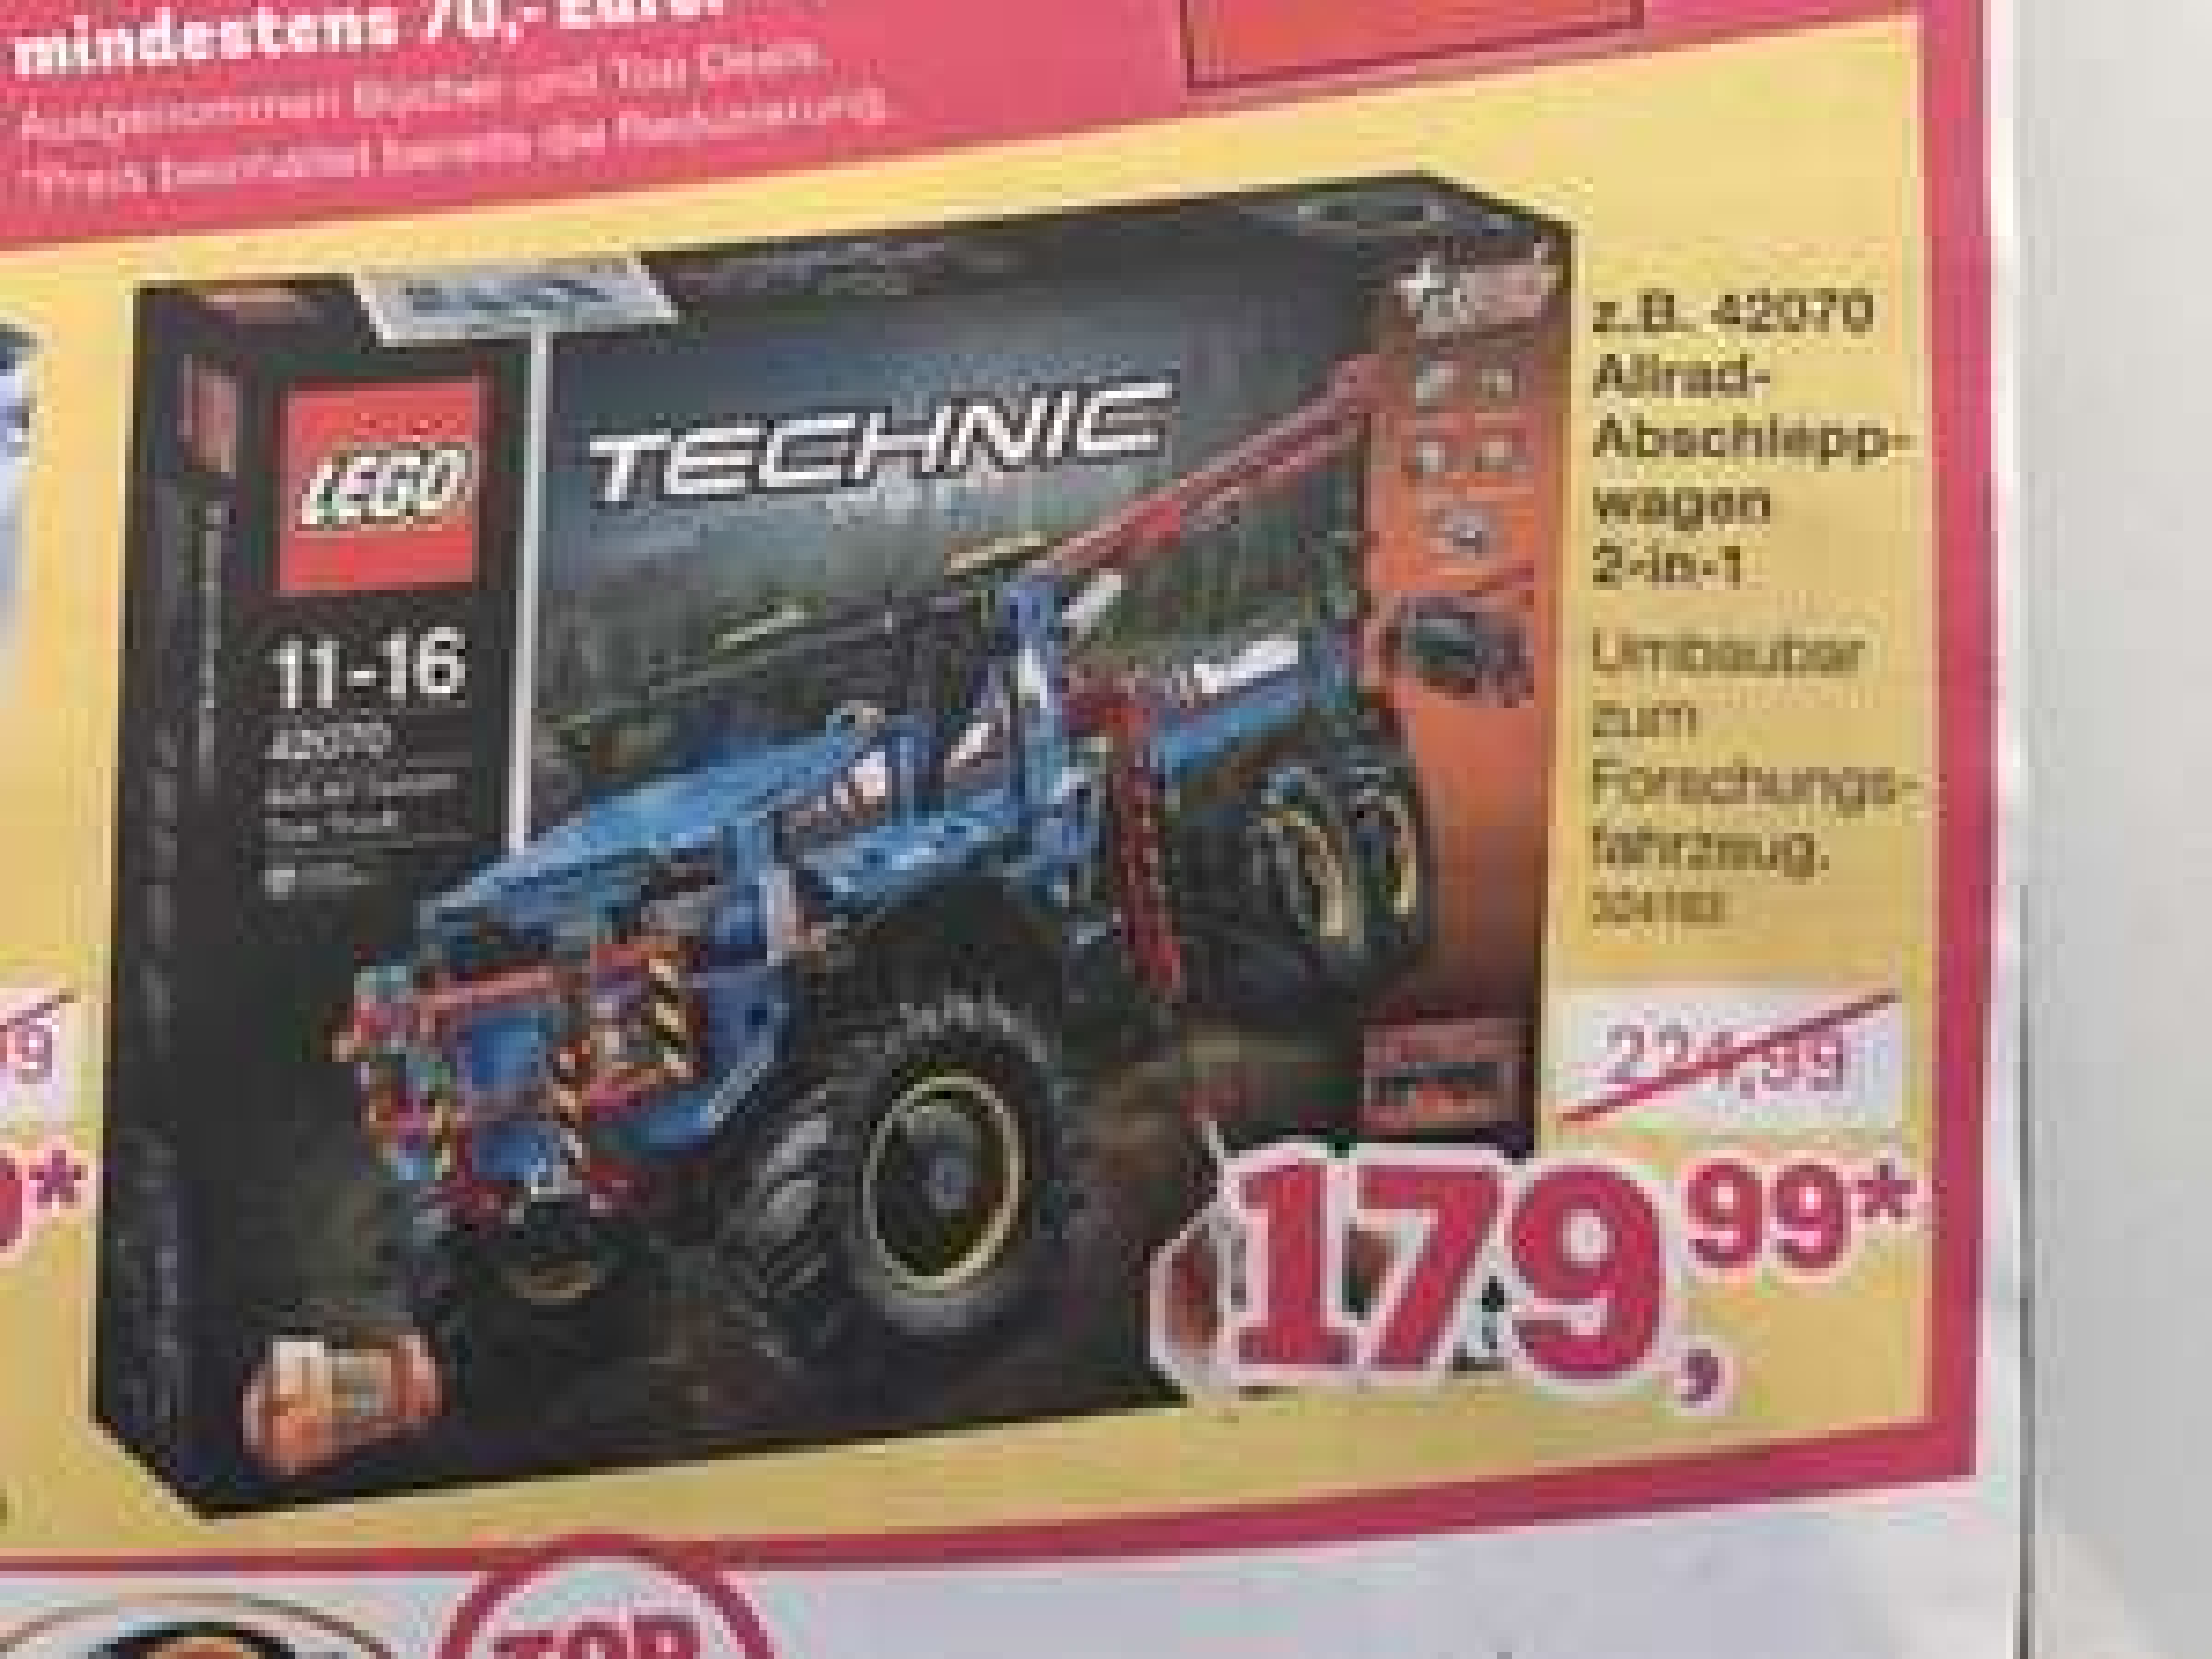 Lego Technic - Allrad Abschleppwagen 2 in 1 - Bei Toys R Us